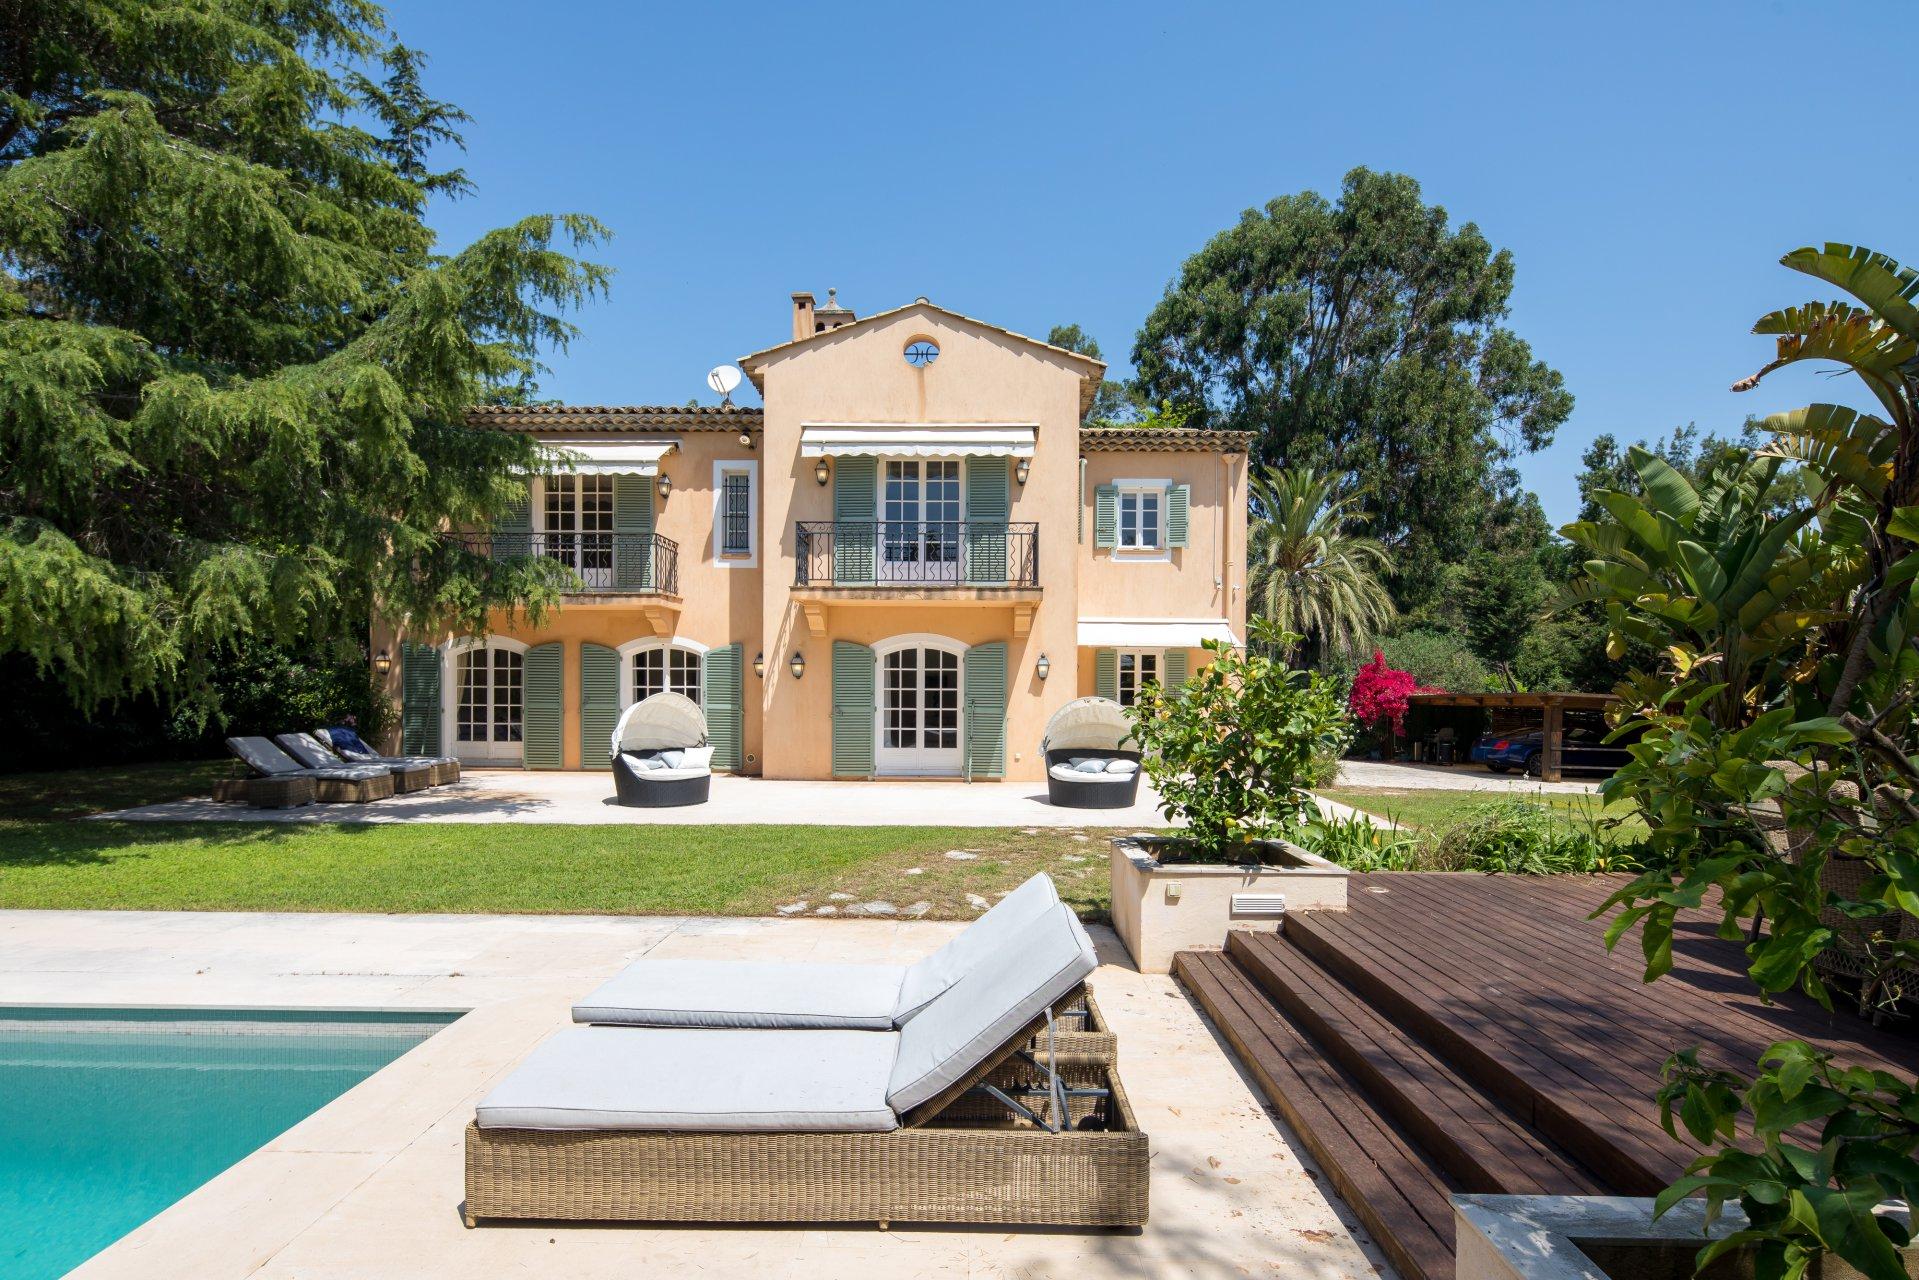 Ad Sale Property Saint-Jean-Cap-Ferrat Le Cap (06230), 10